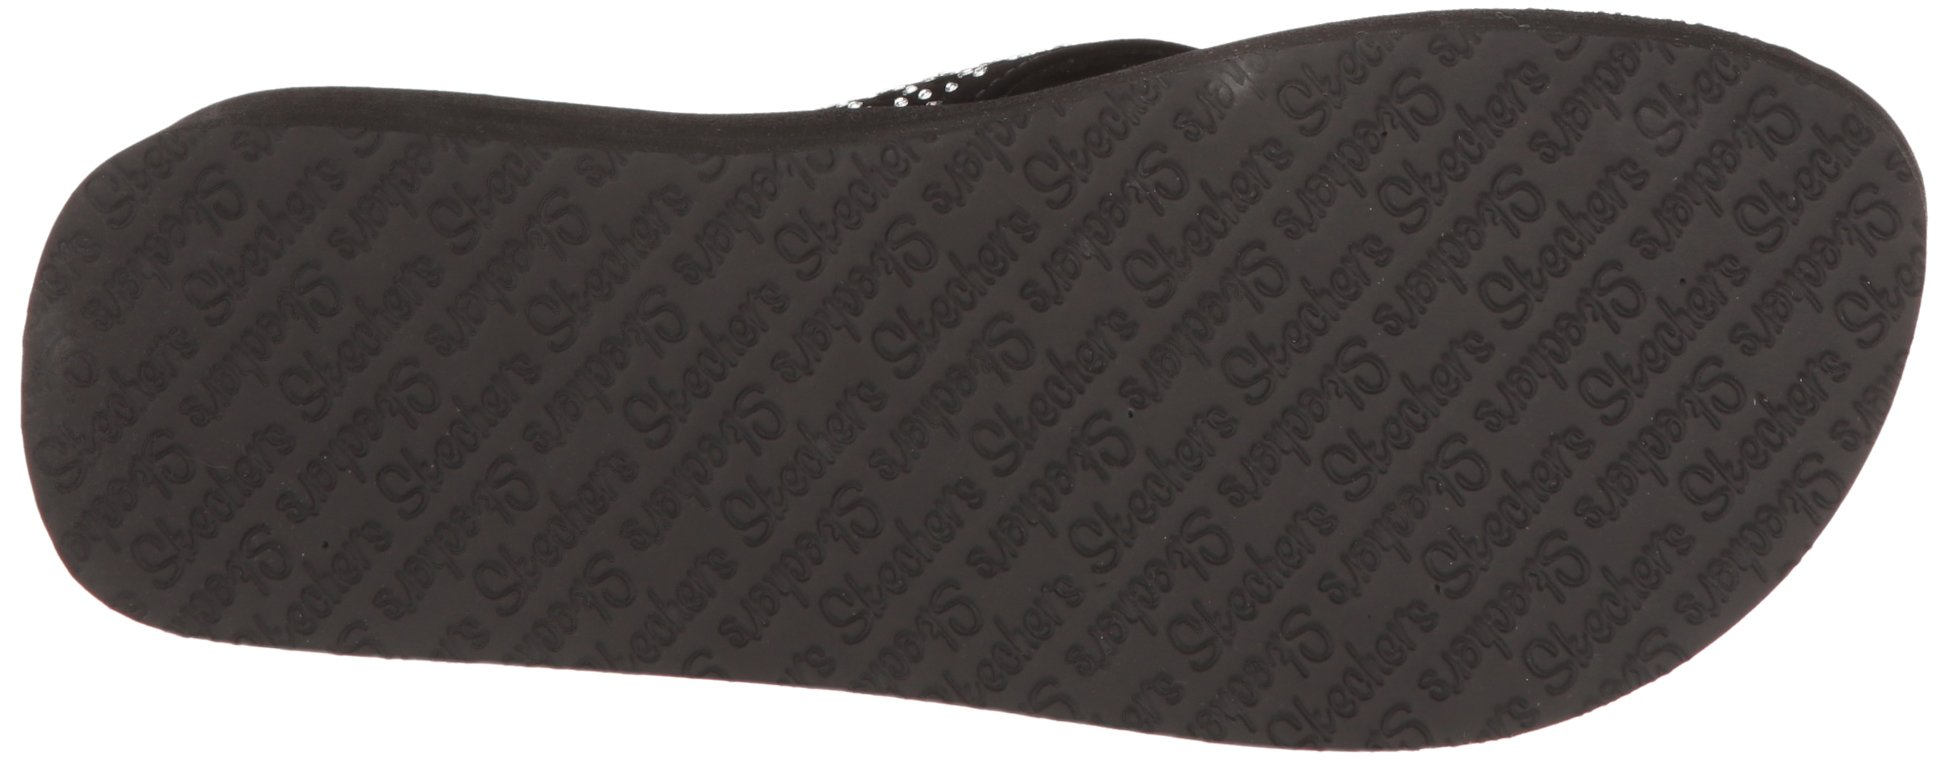 Skechers Cali Women's Vinyasa Flow Wedge Sandal, Black Cutout, 6 B(M) US by Skechers (Image #3)